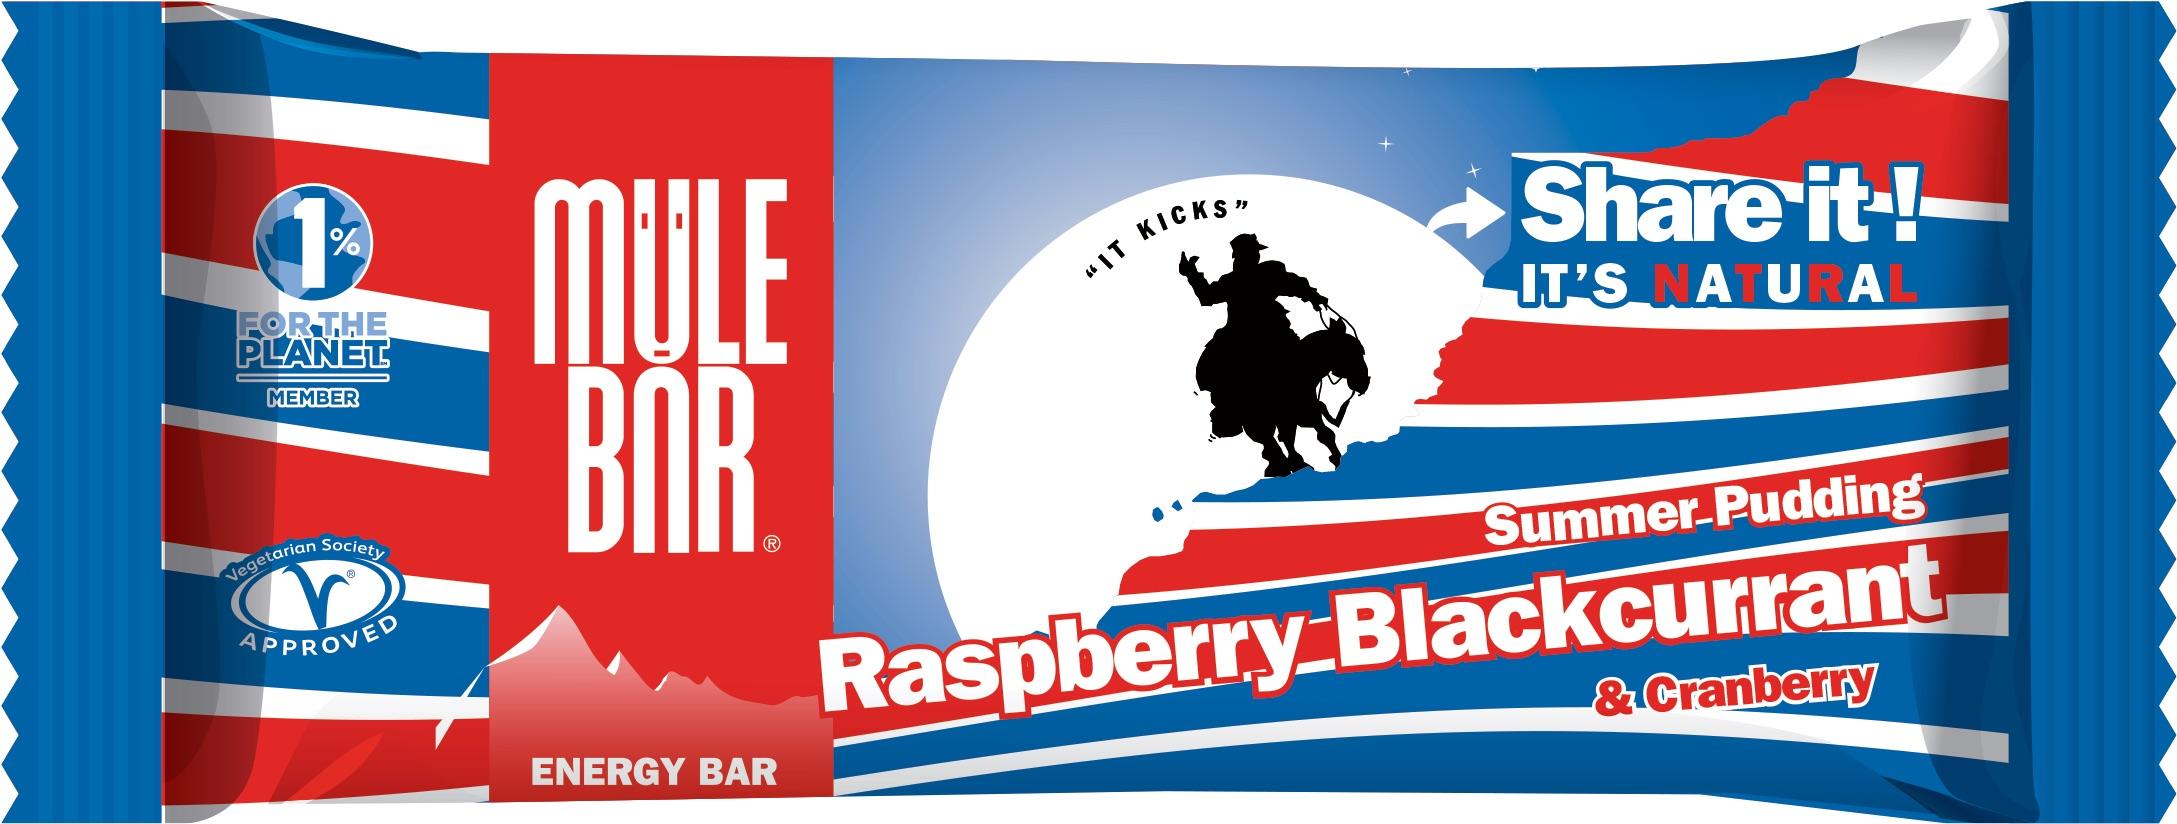 Mulebar Barre énergétique Summer Pudding